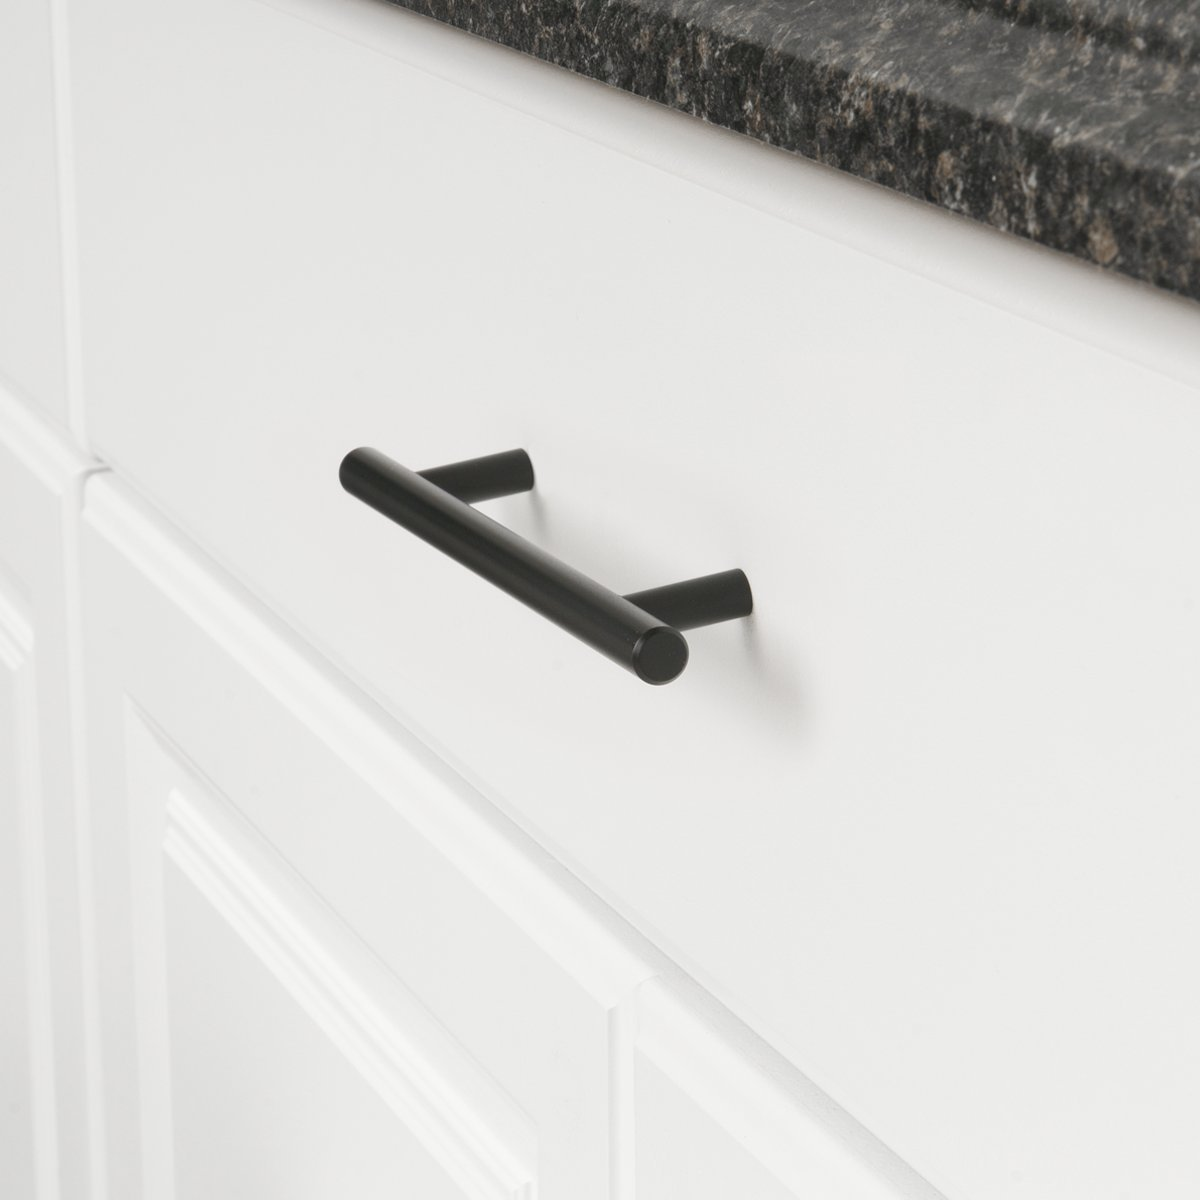 centro del orificio de 7,62 cm Basics AB1500-FB-10 Tirador de armario en forma de barra 13,66 cm de longitud Negro liso tipo europeo Flat Black